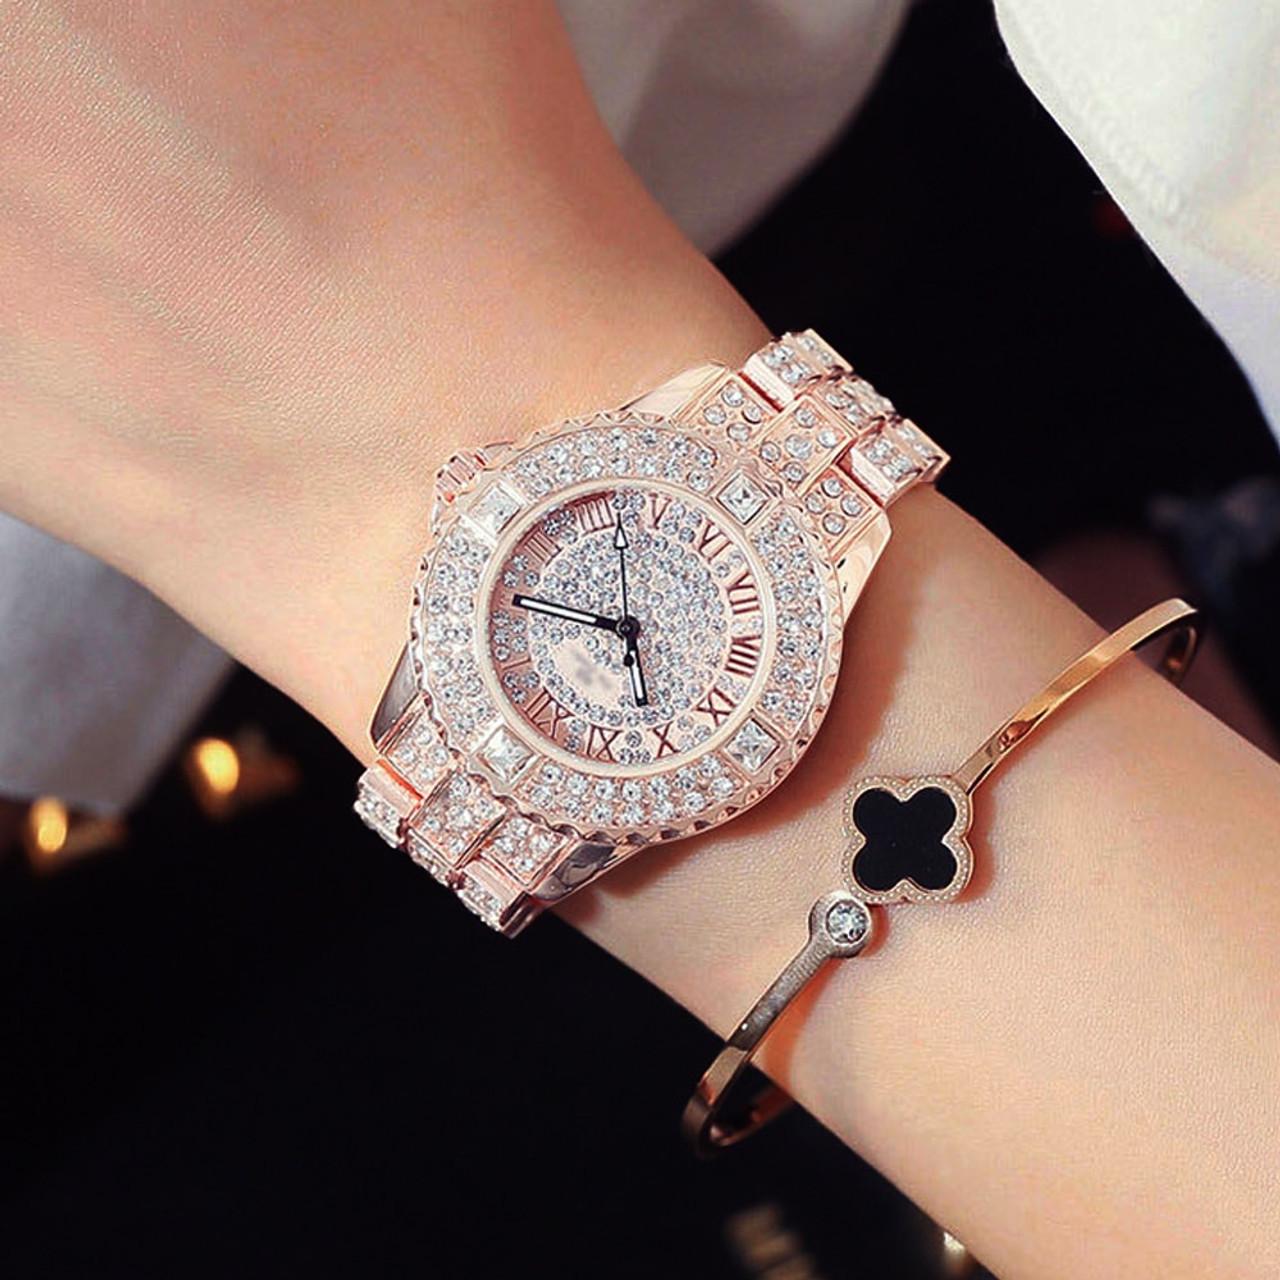 New Luxury Rhinestone Bracelet Watch Women Diamond Fashion Ladies Dress  Watch Brand Stainless Steel Crystal Wristwatch Clock - OnshopDeals.Com 9a5f0c233bad